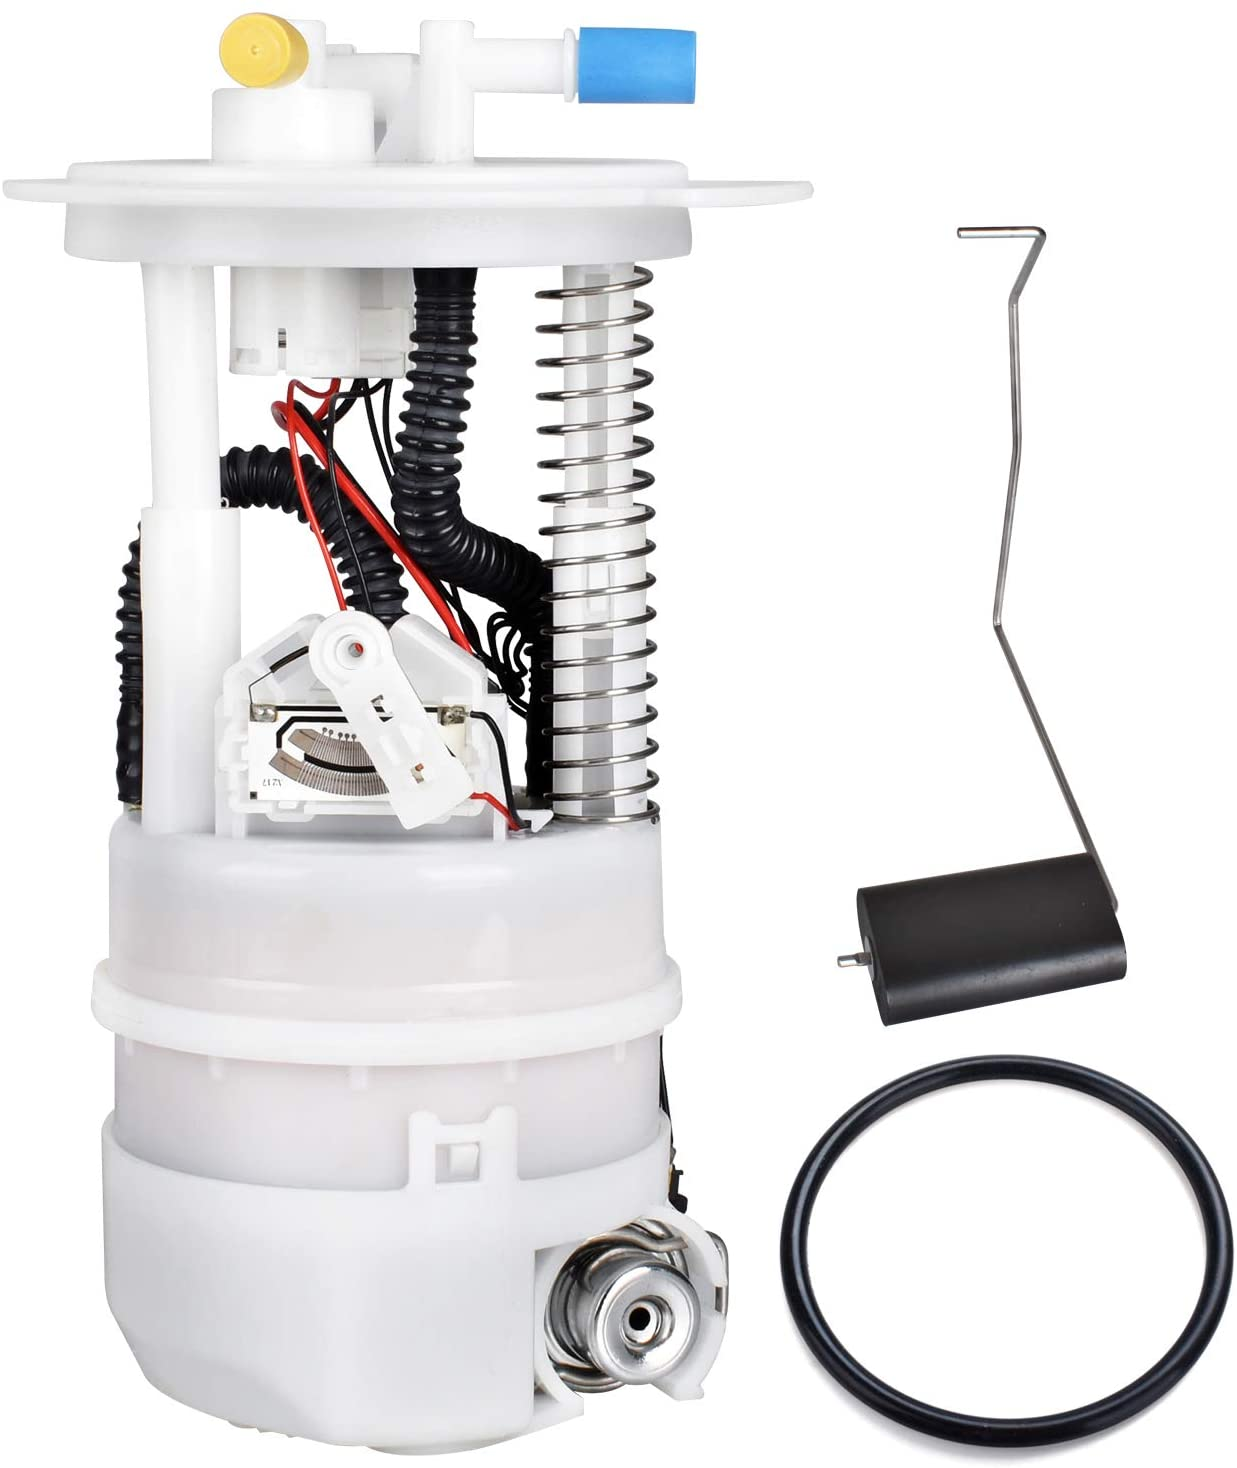 FAERSI Fuel Pump Assembly Replace OEM# E8545M Compatible with Nissan Altima 2004 2005 2006 Maxima & Quest 2004 2005 2006 2007 2008 Quest 2009 2.5L I4/3.5L V6 (Except California Emissions)